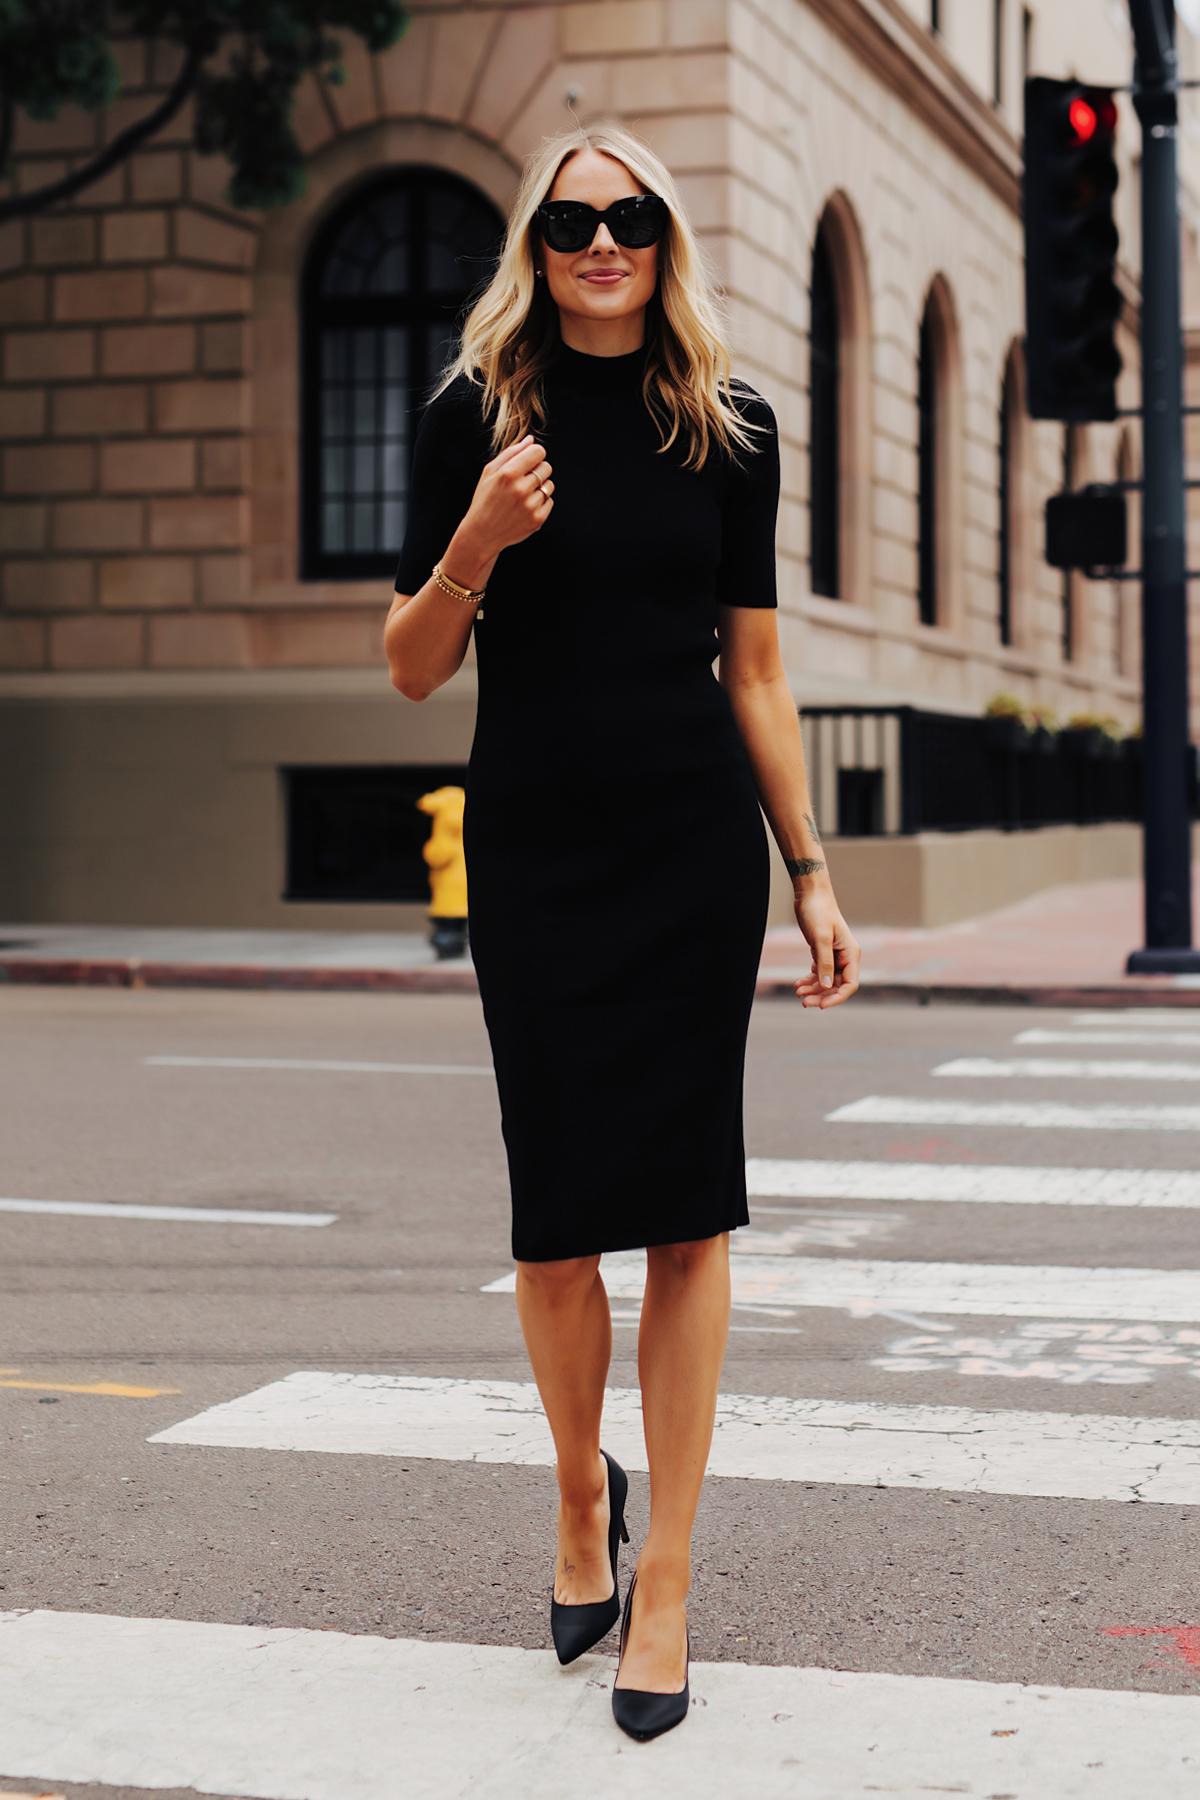 Fashion Jackson Wearing Black Midi Dress Black Pumps 4